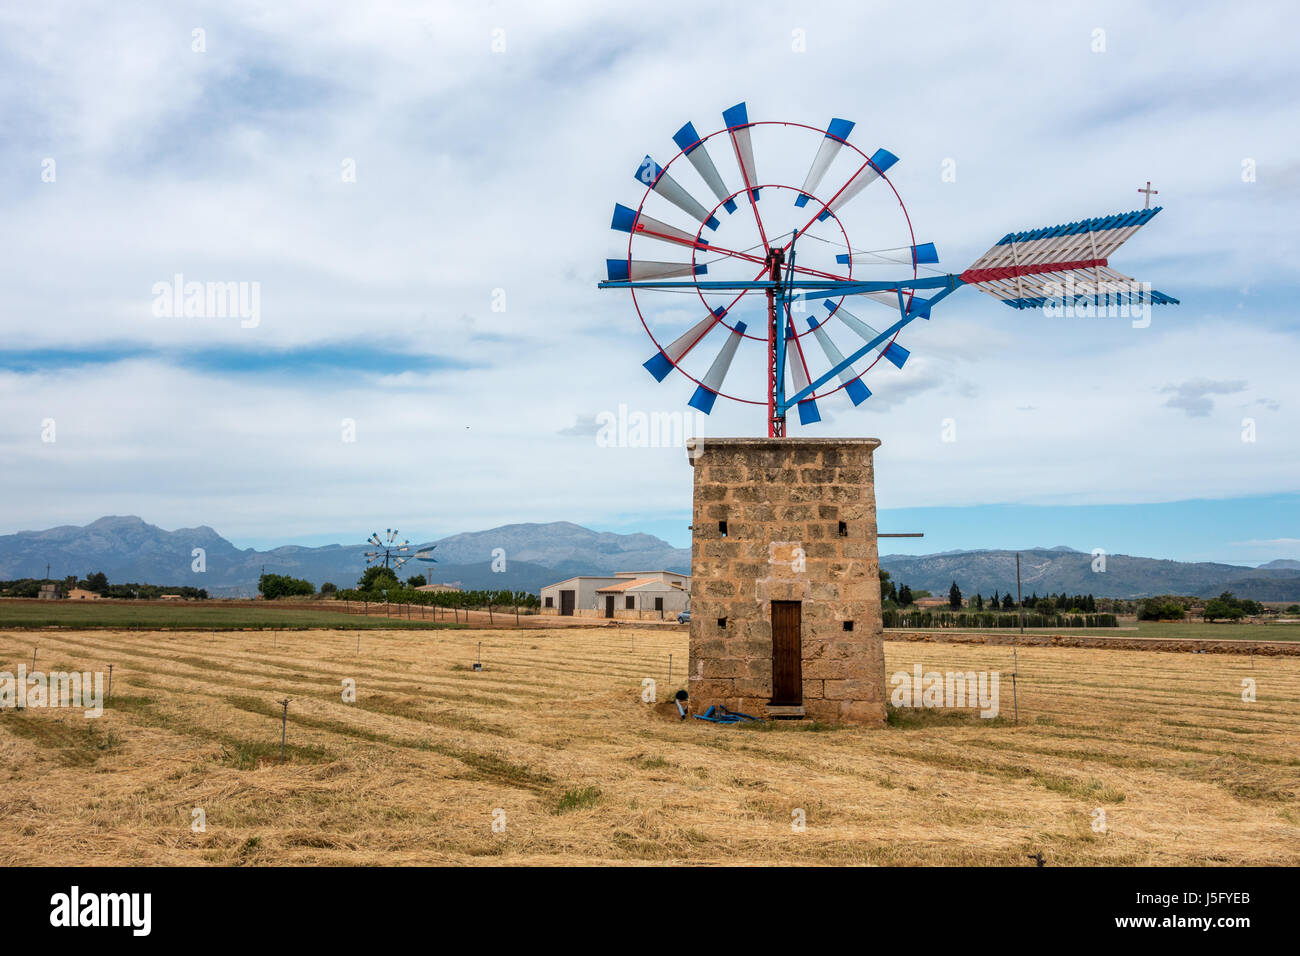 Antiguo molino se usa para la agricultura en el norte de Mallorca, Islas Baleares, España Imagen De Stock